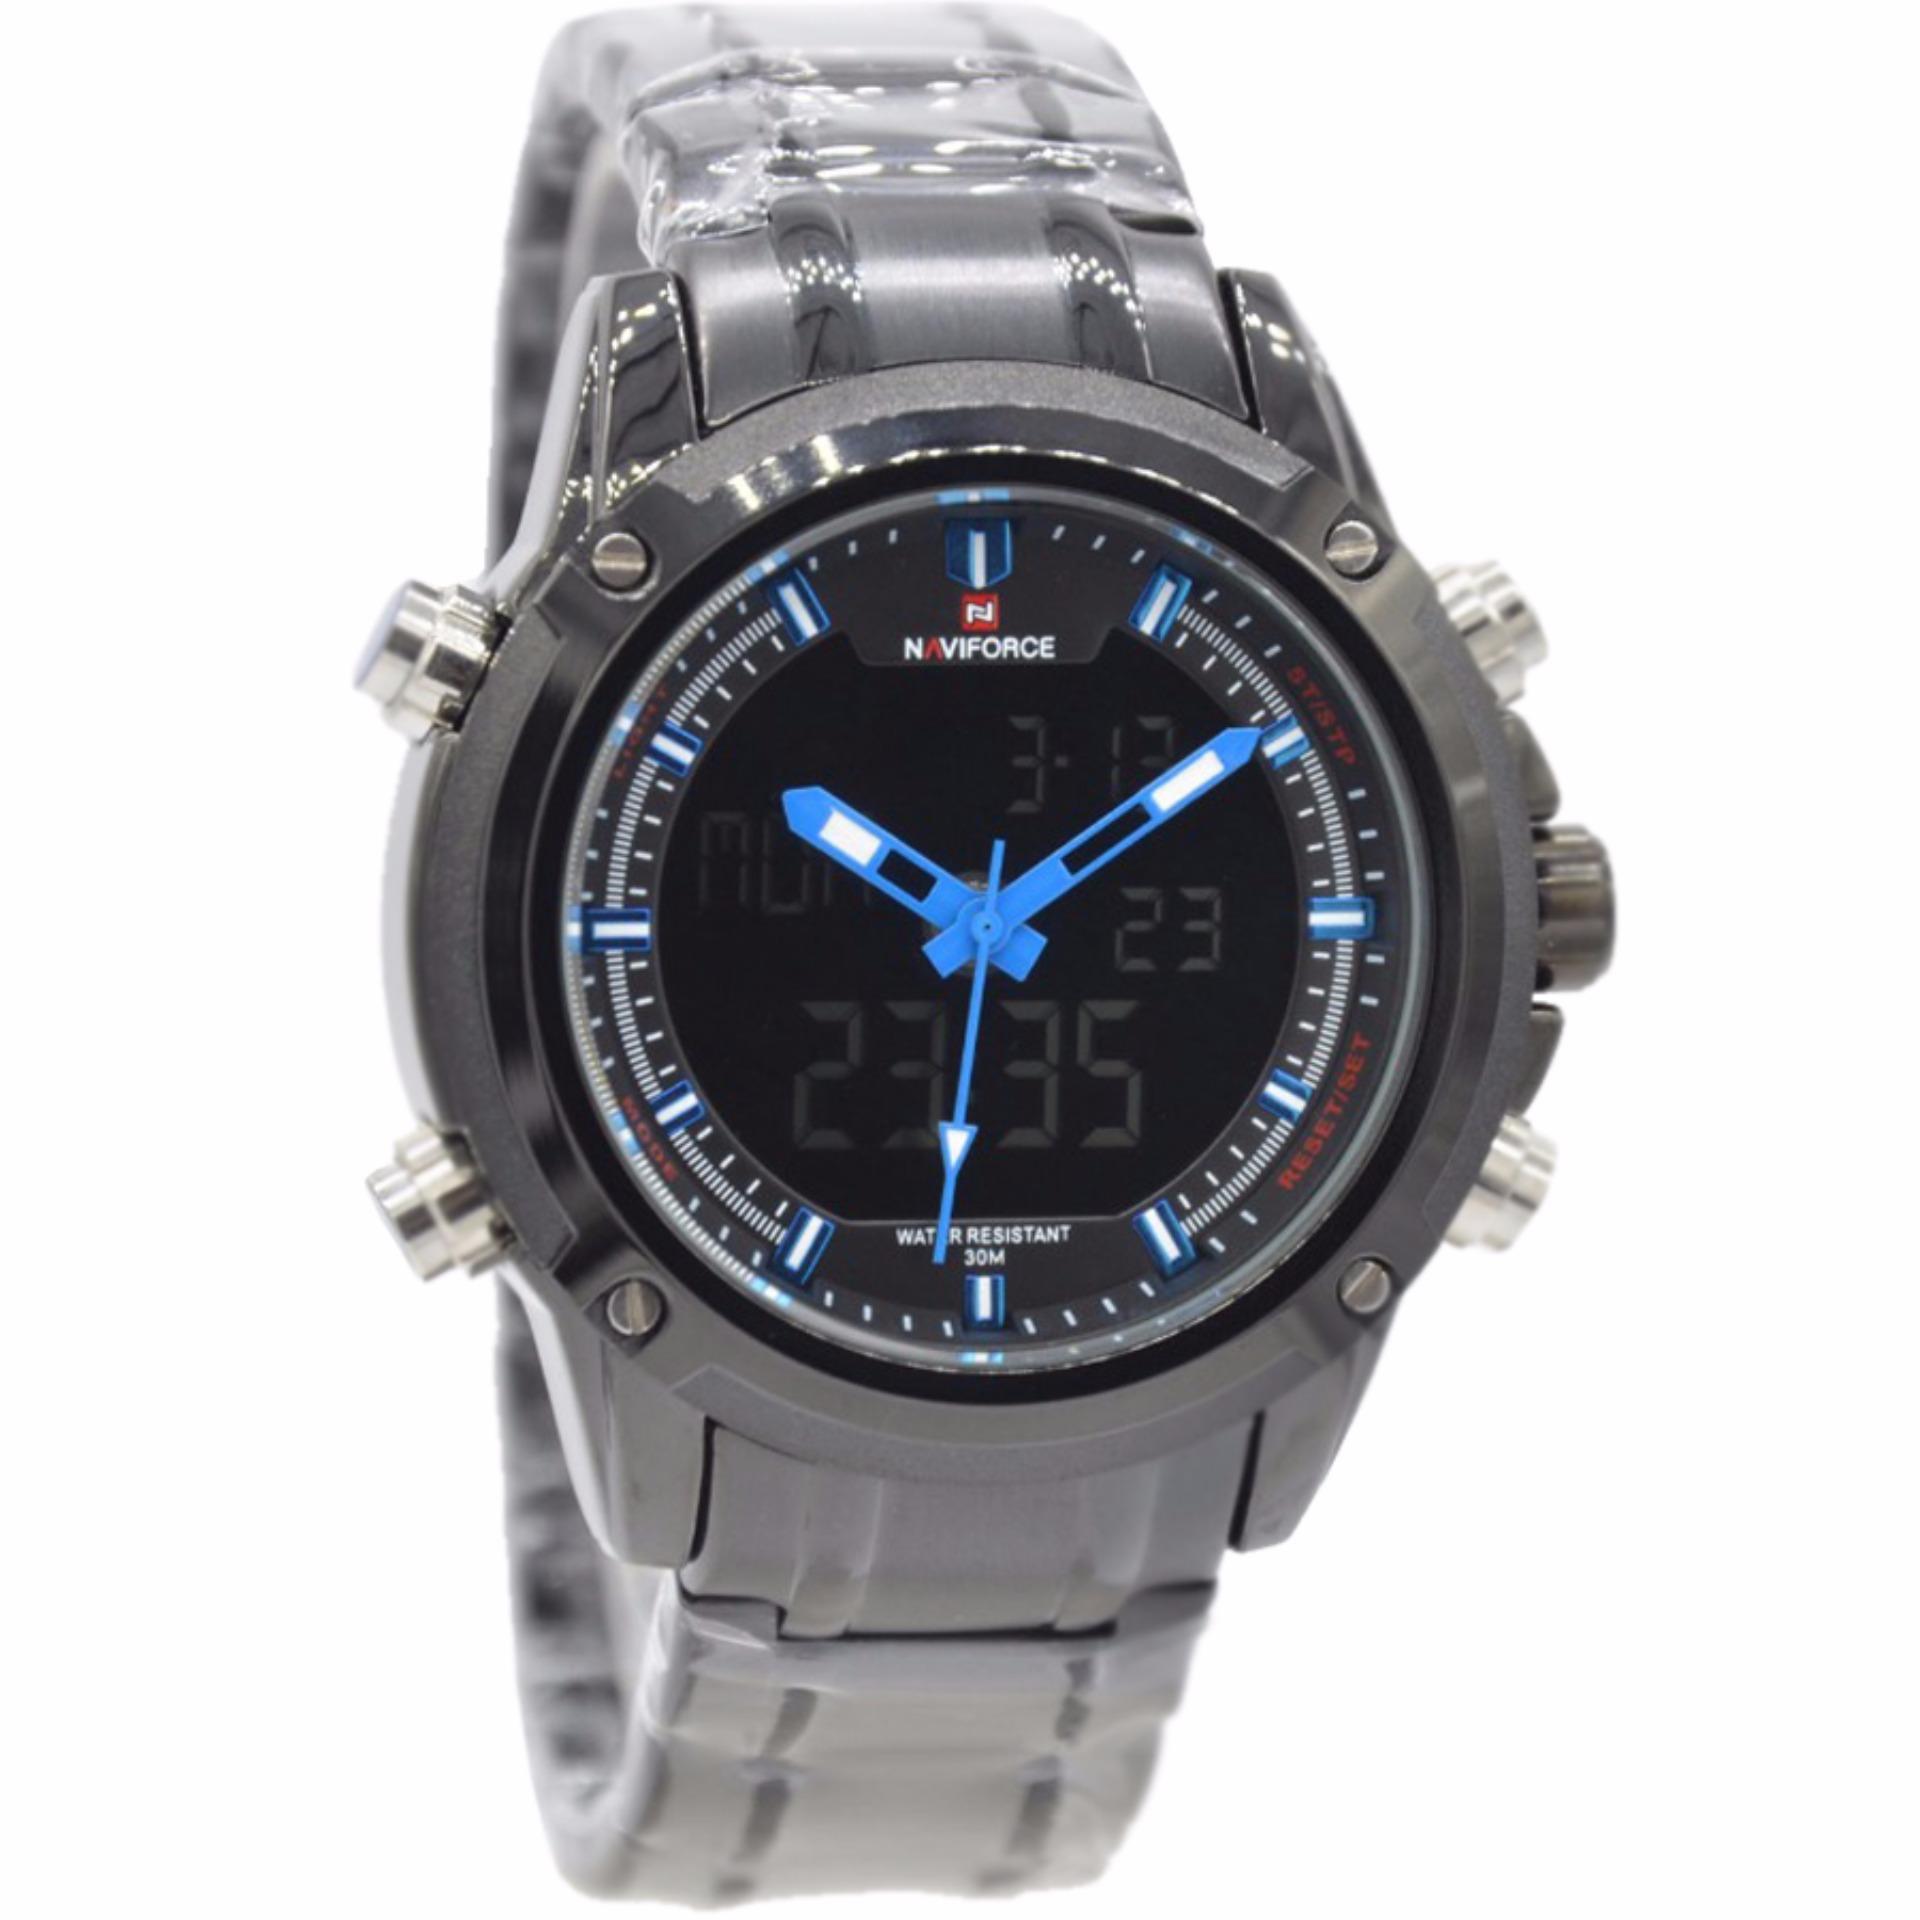 Harga Naviforce Nf09861 Dual Time Jam Tangan Pria Stainless Steel Hitam Biru Branded